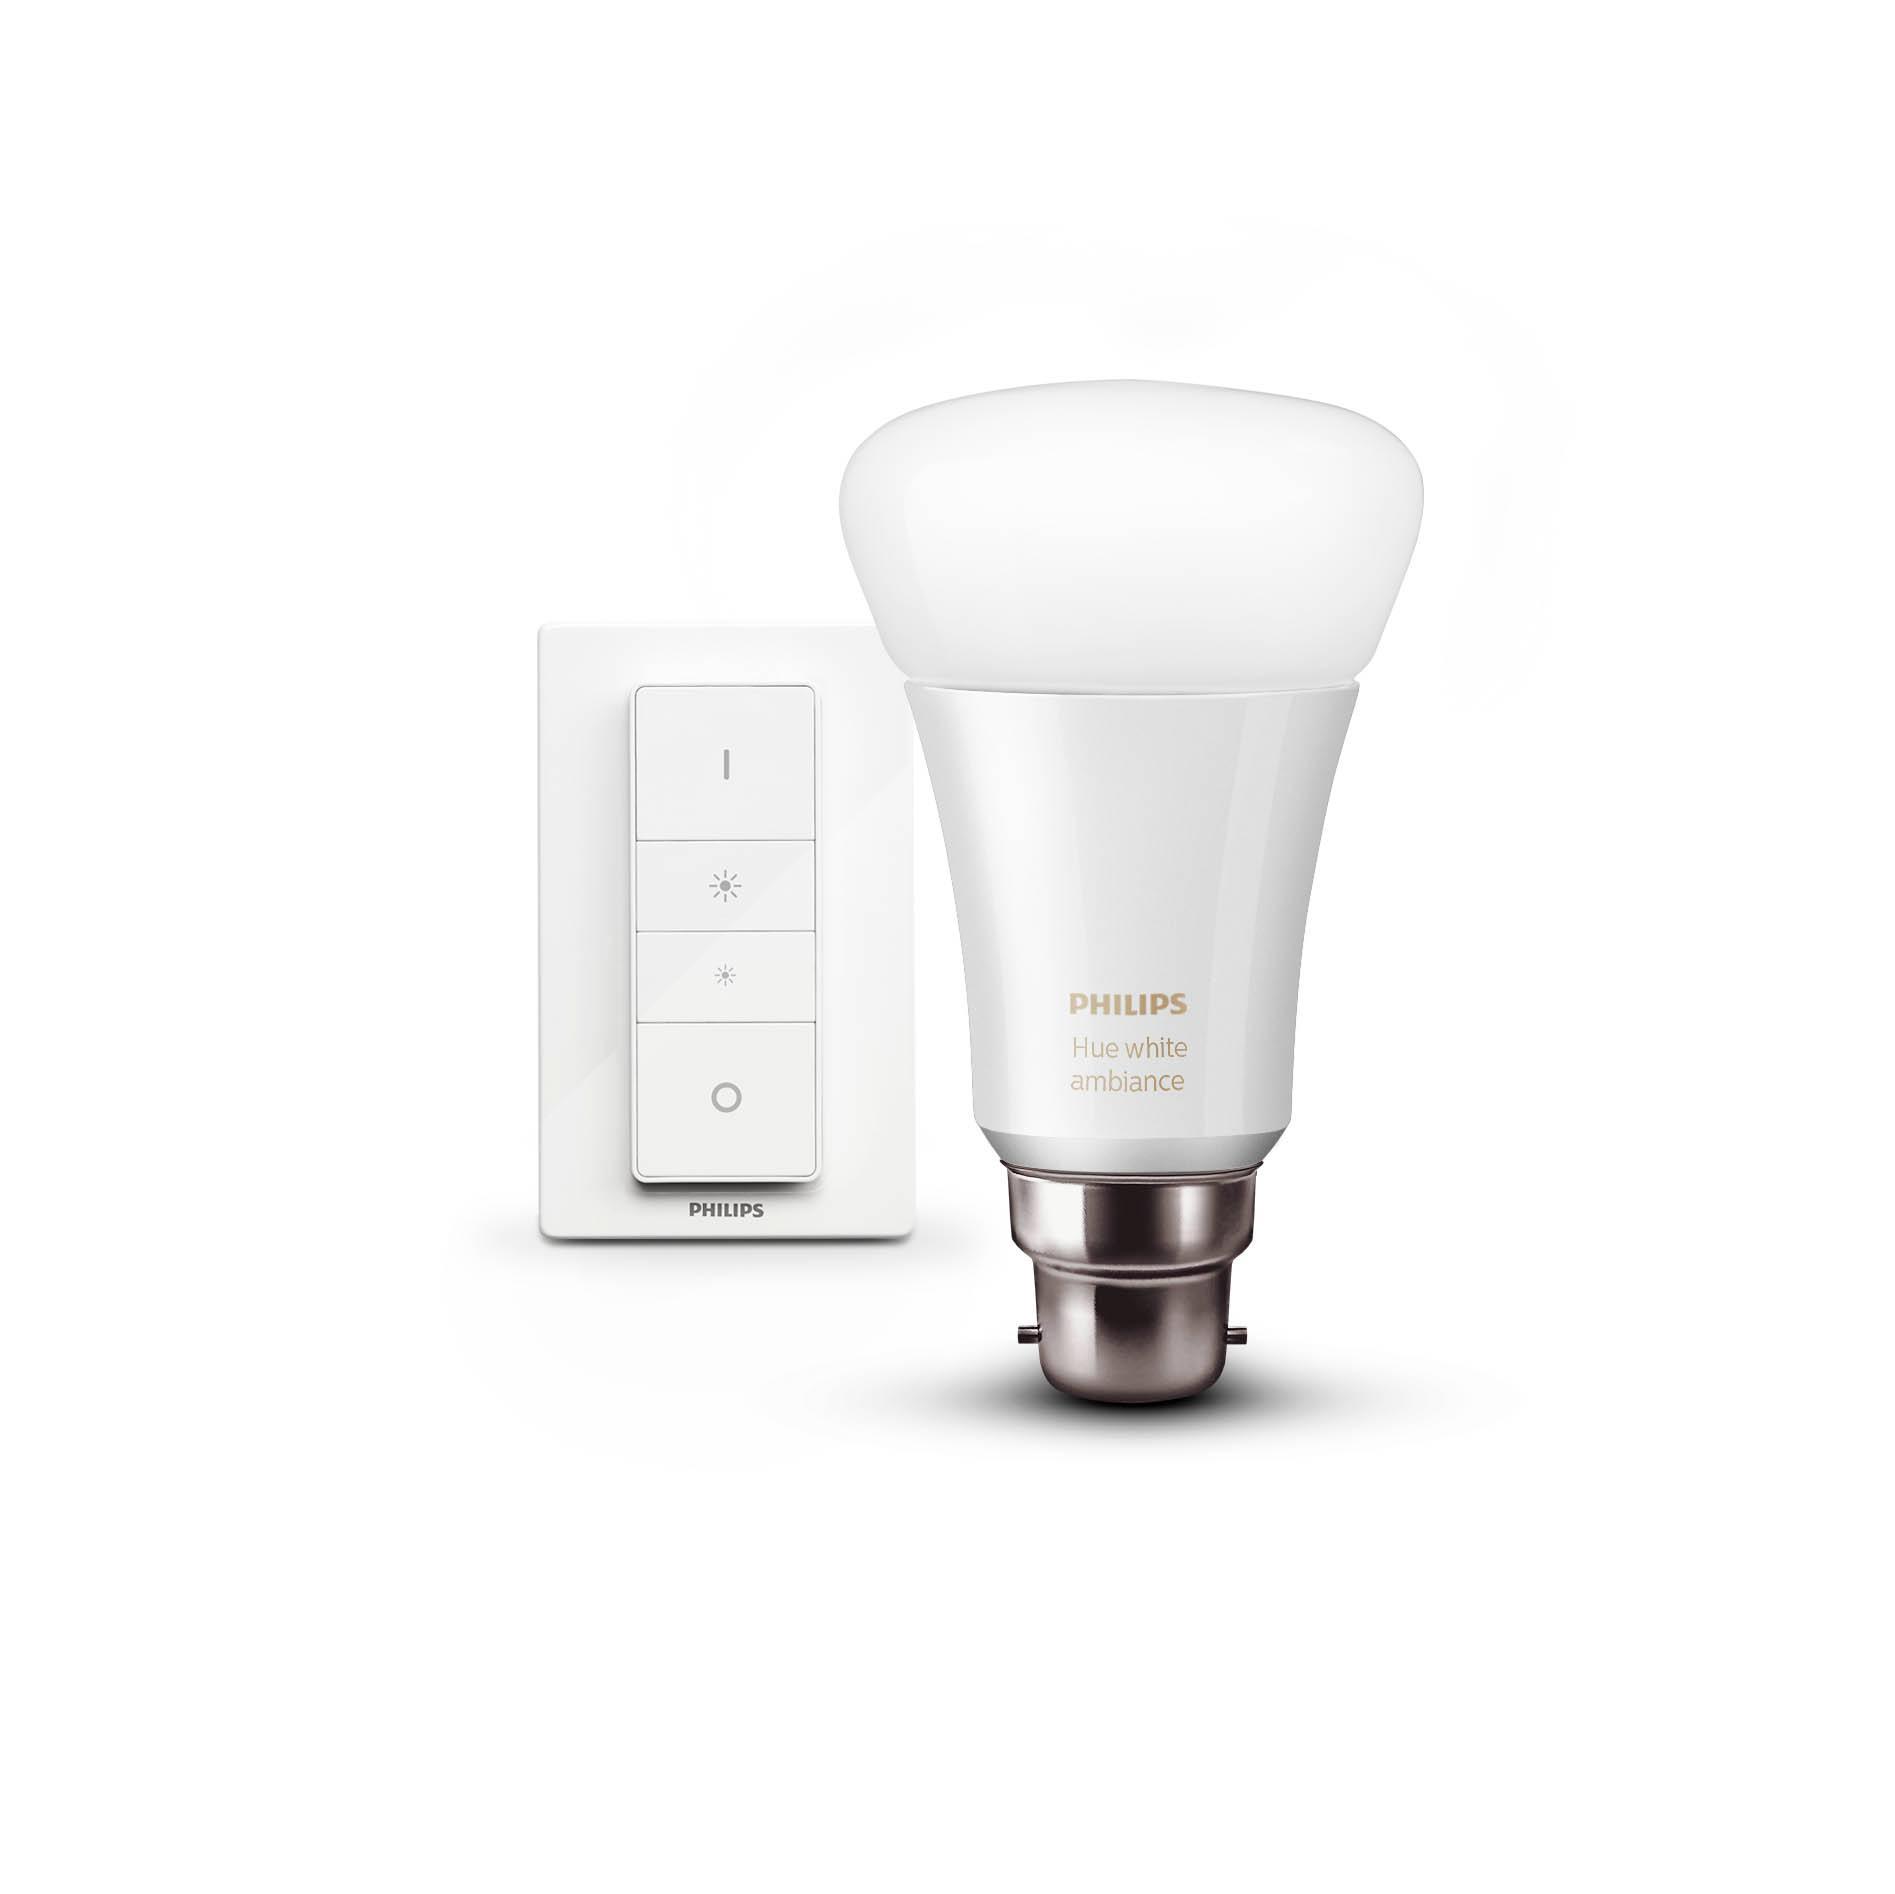 Philips Philips Hue Light Recipe Kit LED Bulbs